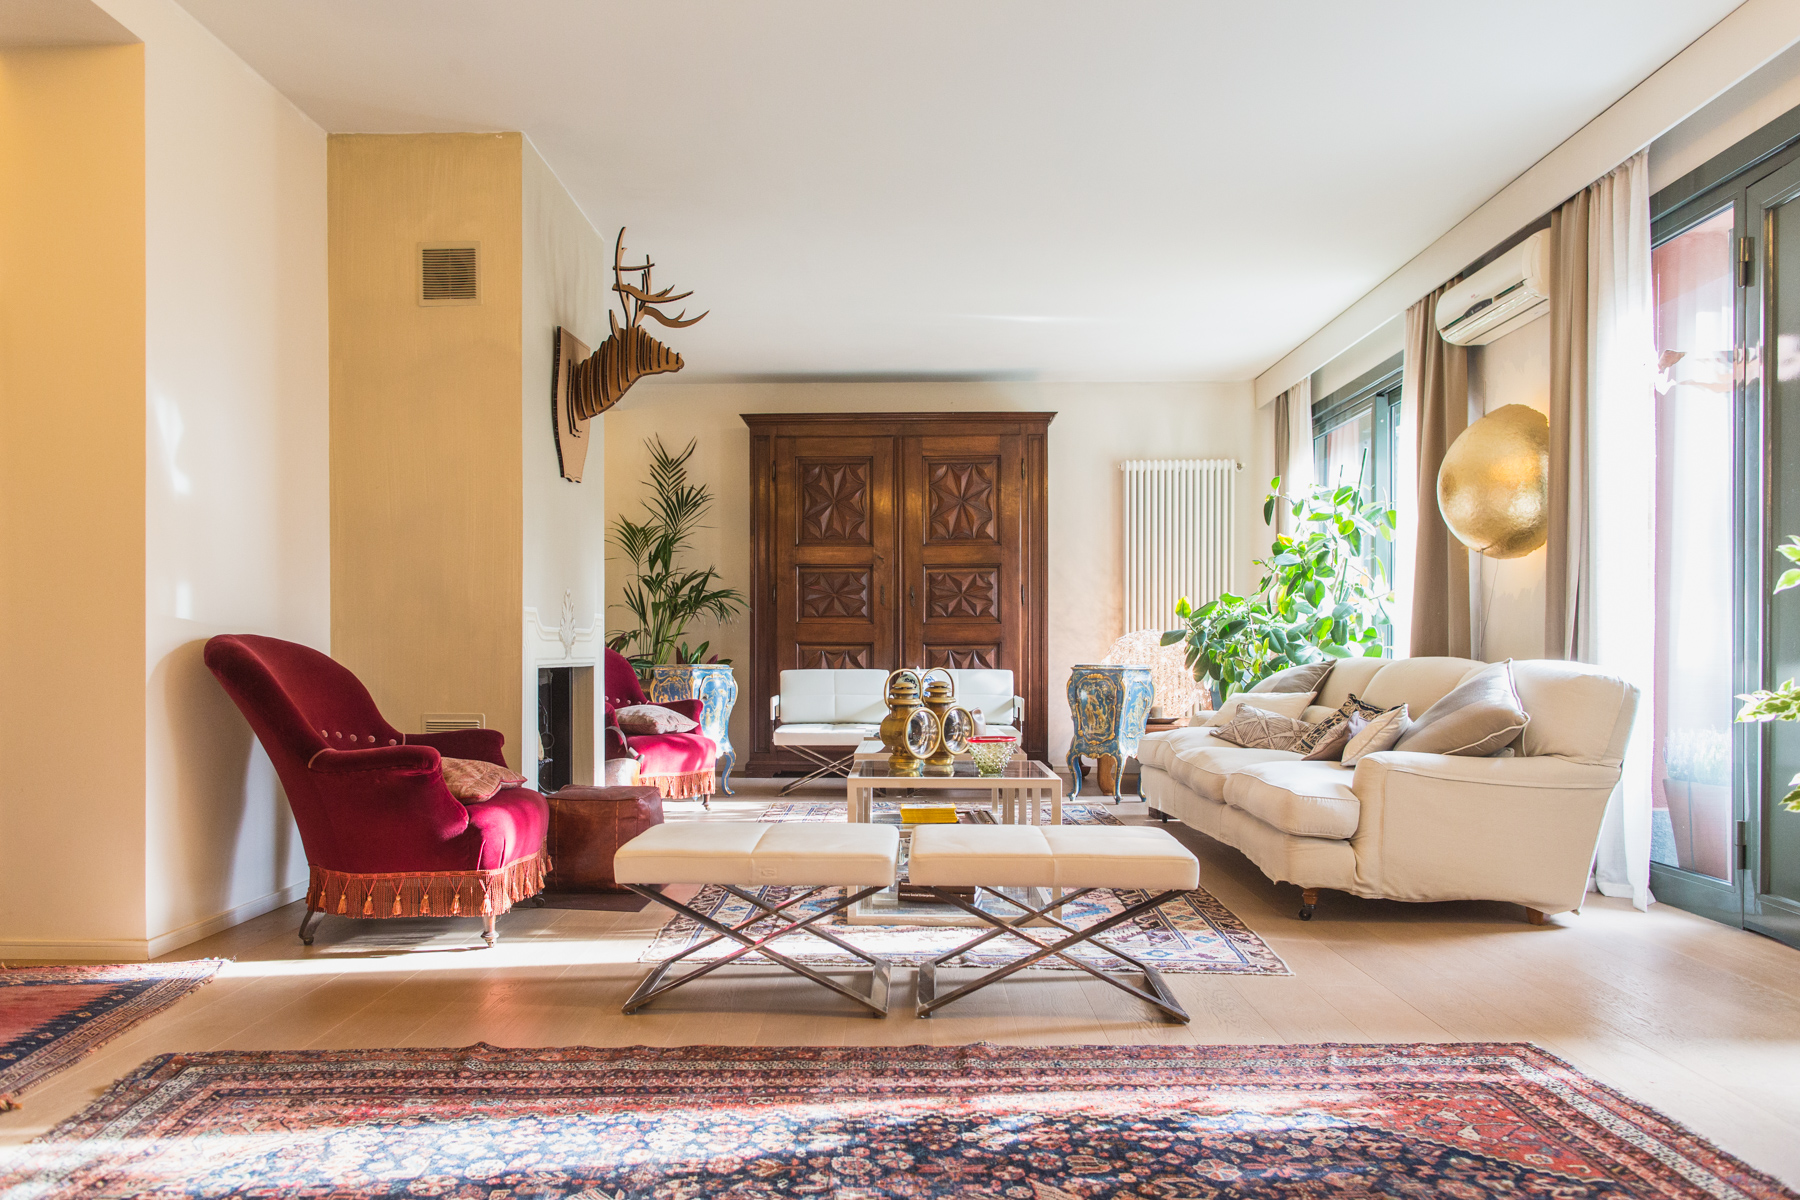 Casa indipendente in Vendita a Torino: 5 locali, 295 mq